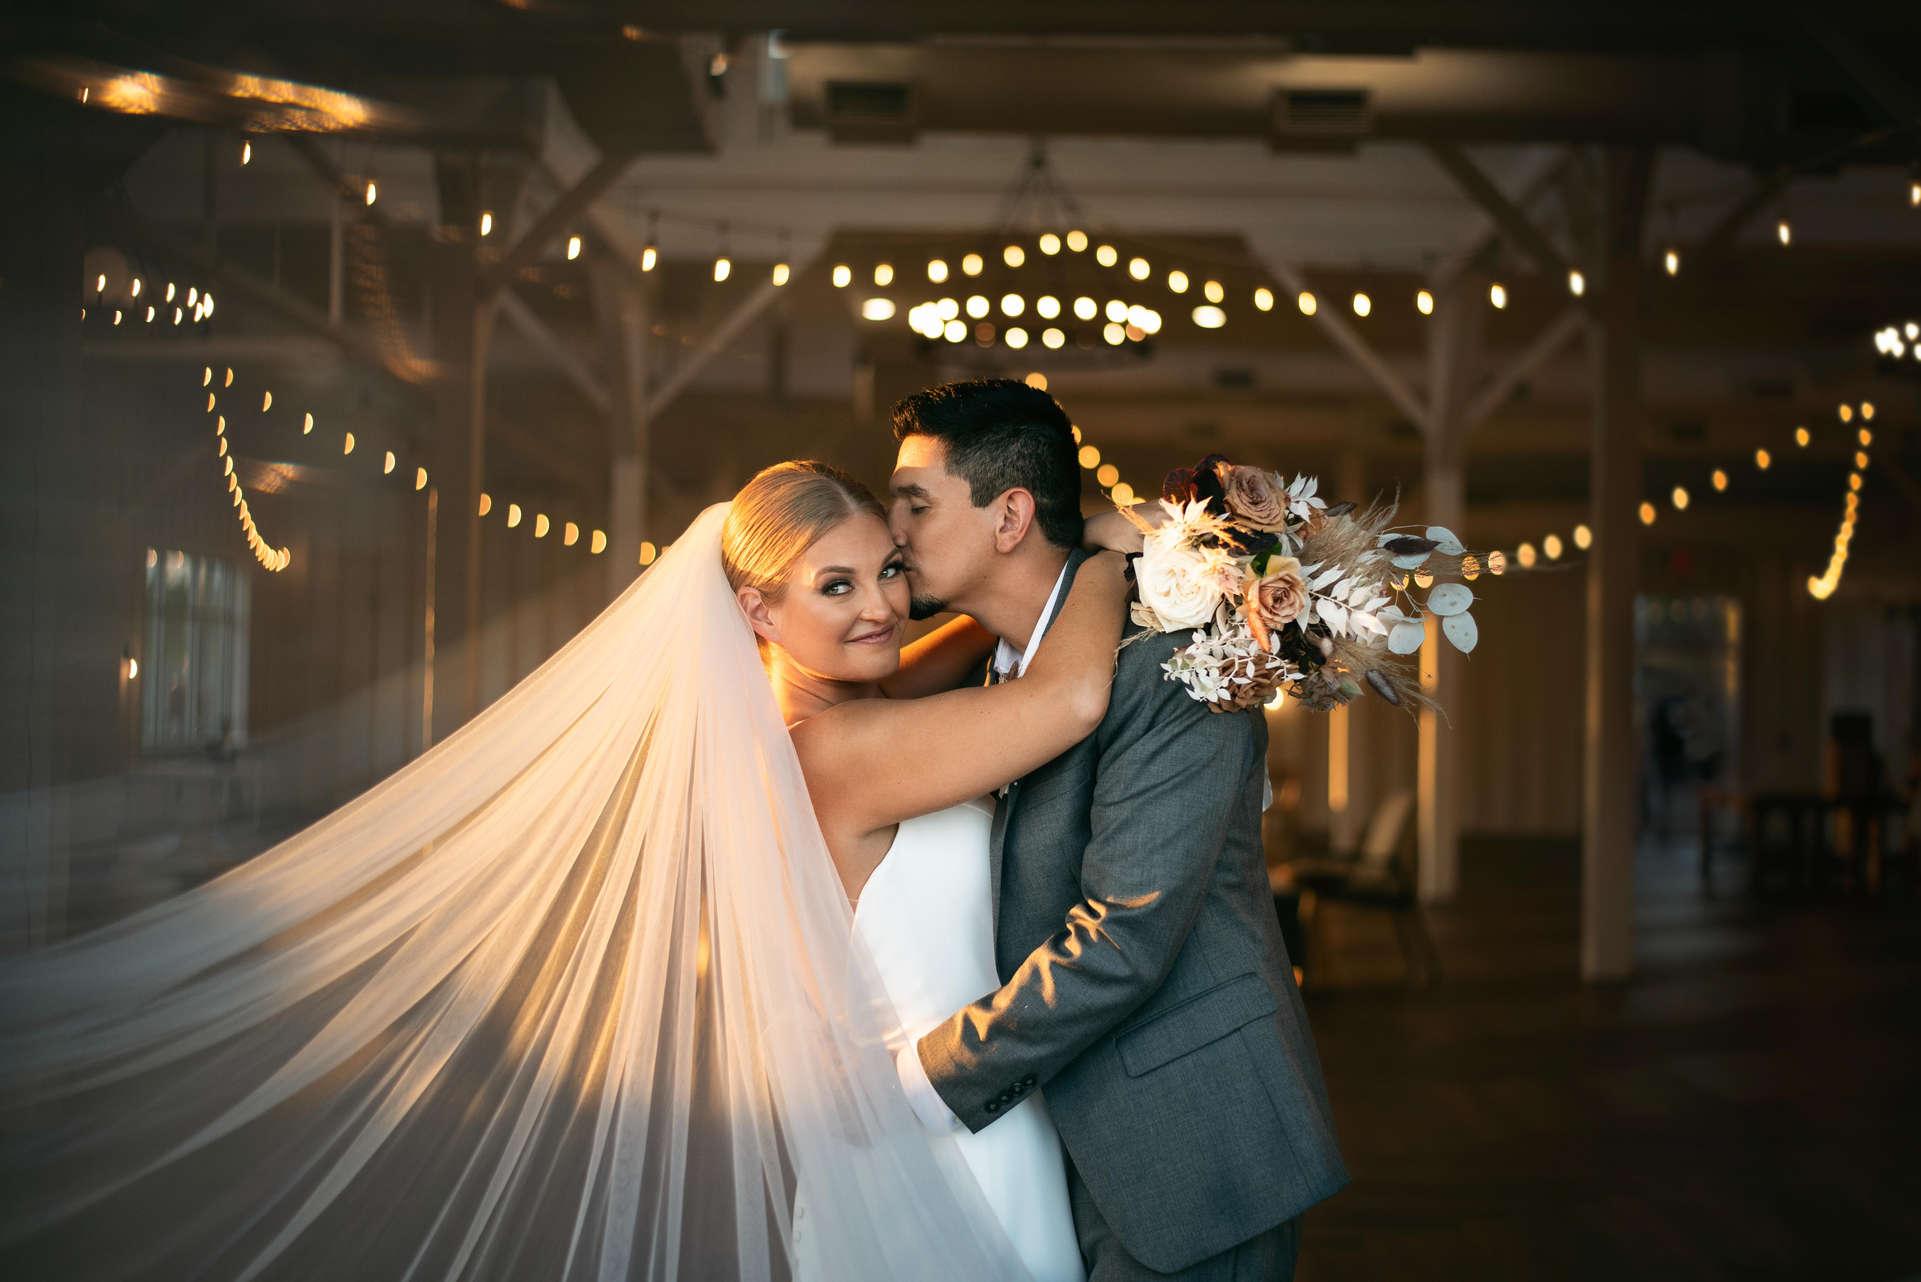 Marit_Kundar_Photography_wedding68.jpg